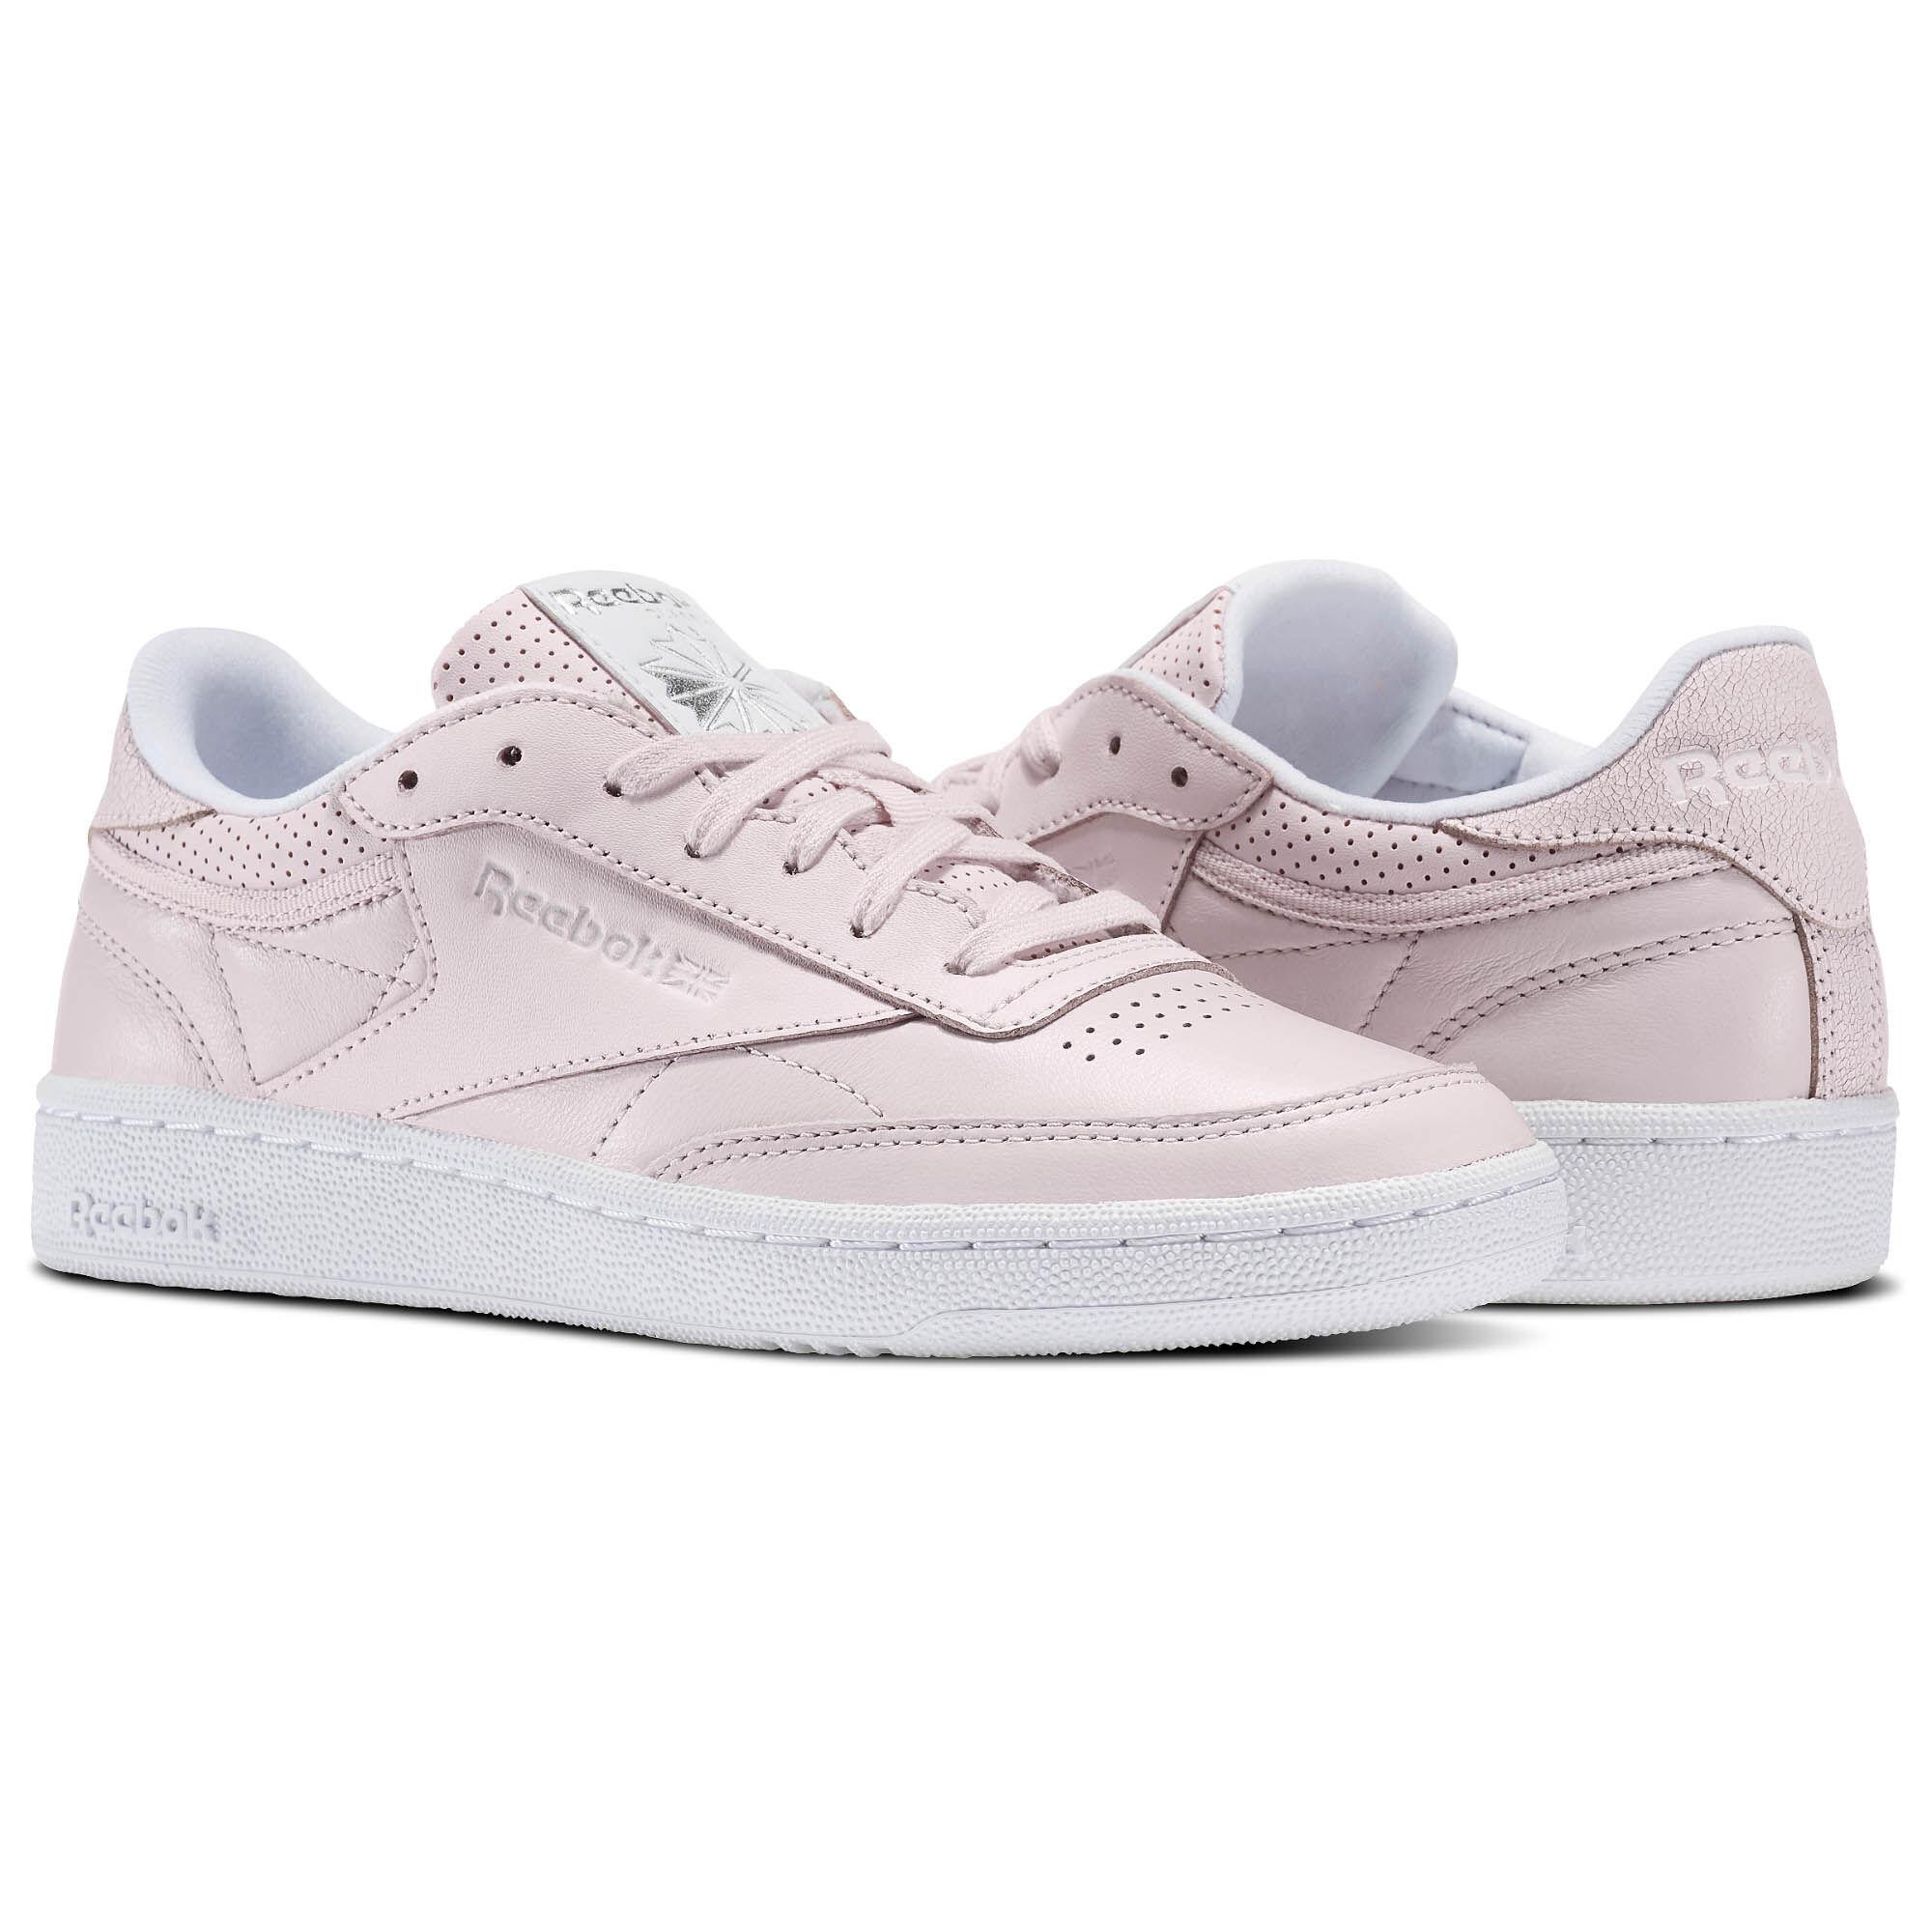 Womens Club C 85 Fbt Training Shoes, Pink Reebok